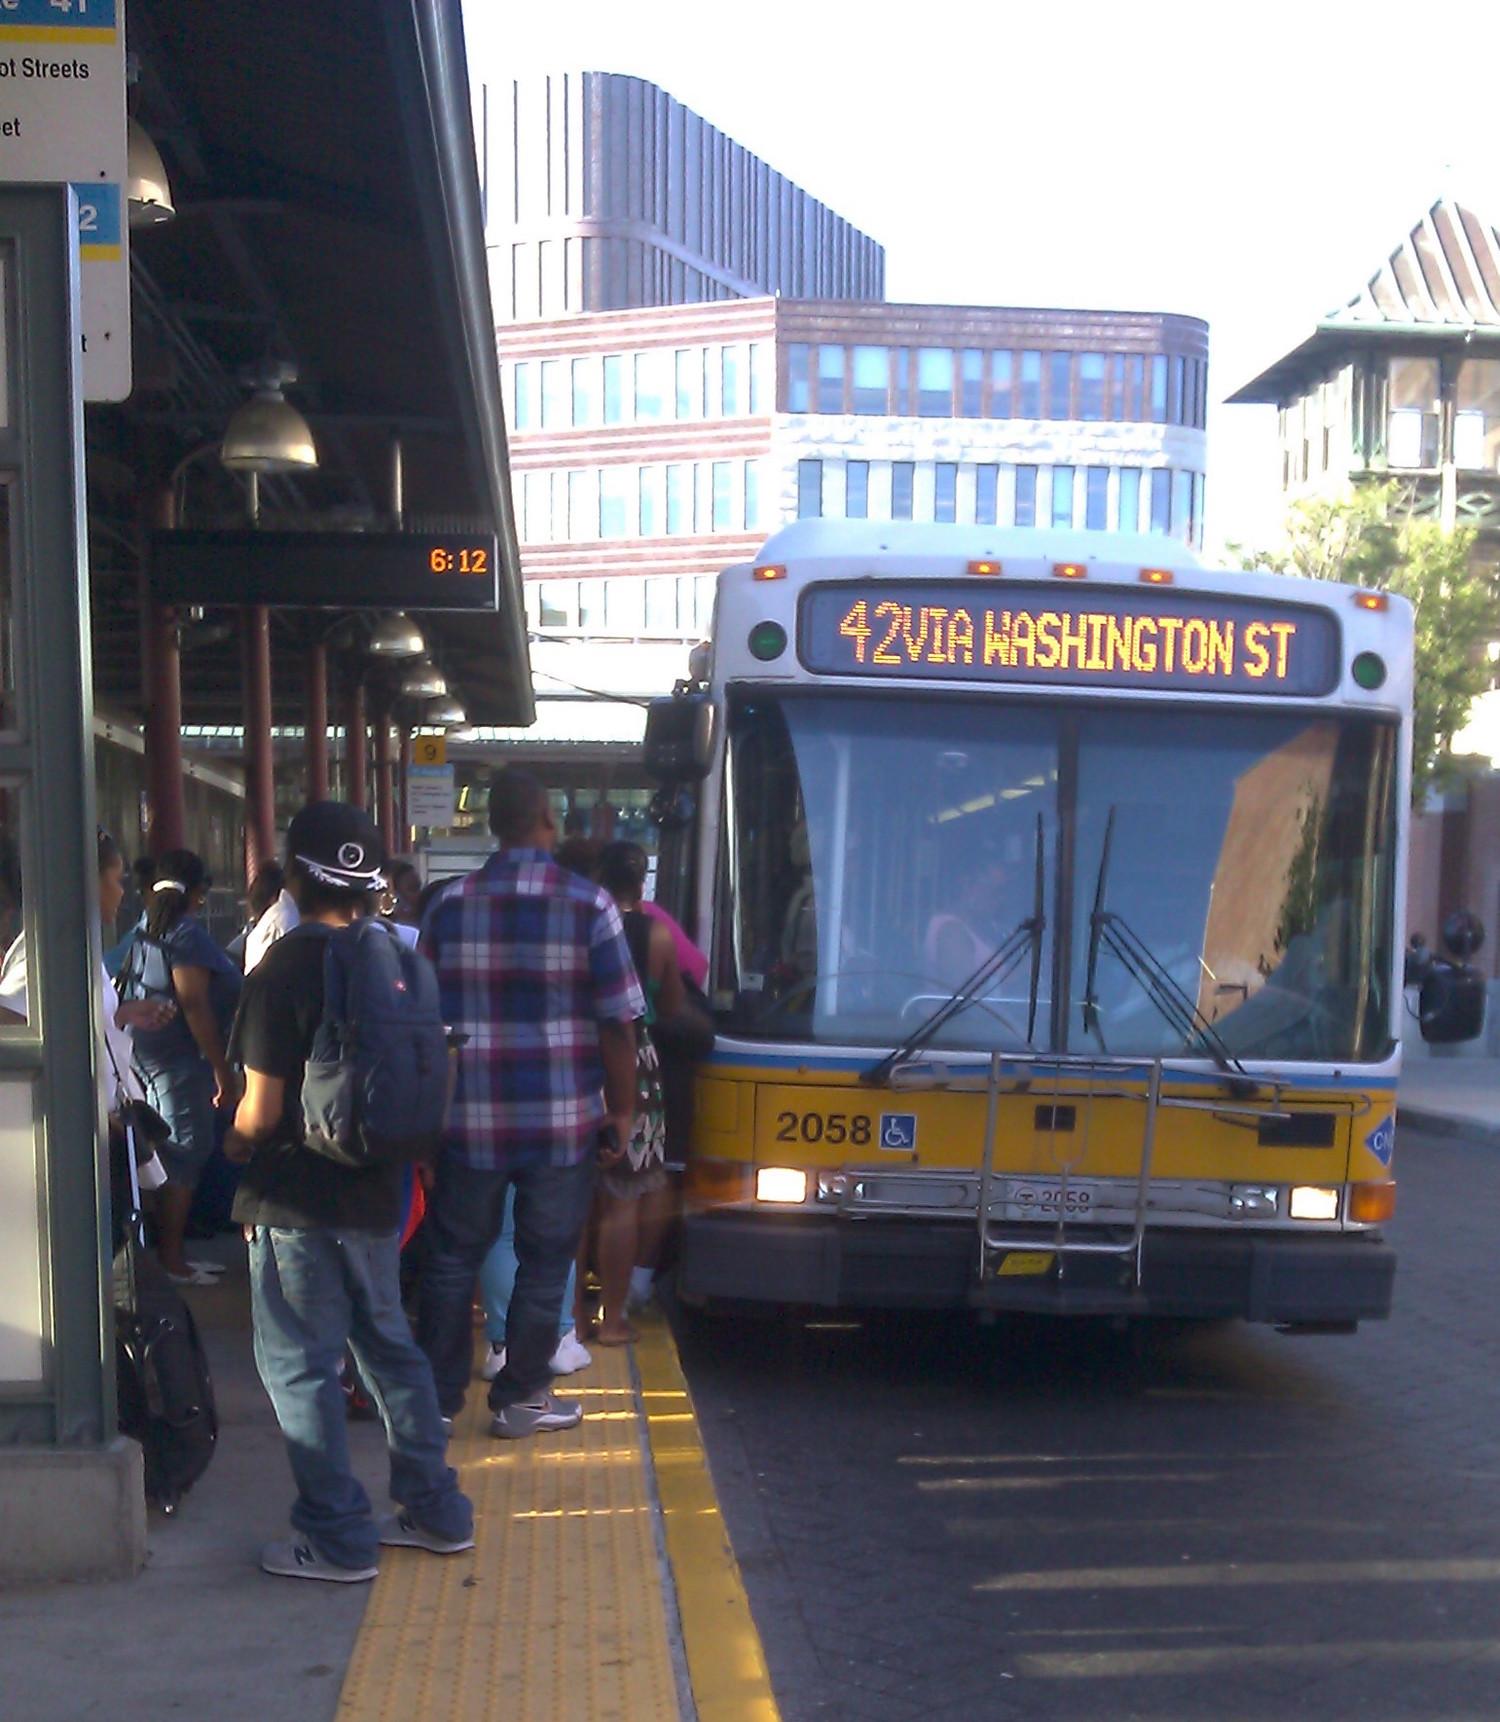 Raise MBTA Service Quality, Revenue & Ridership, not fares